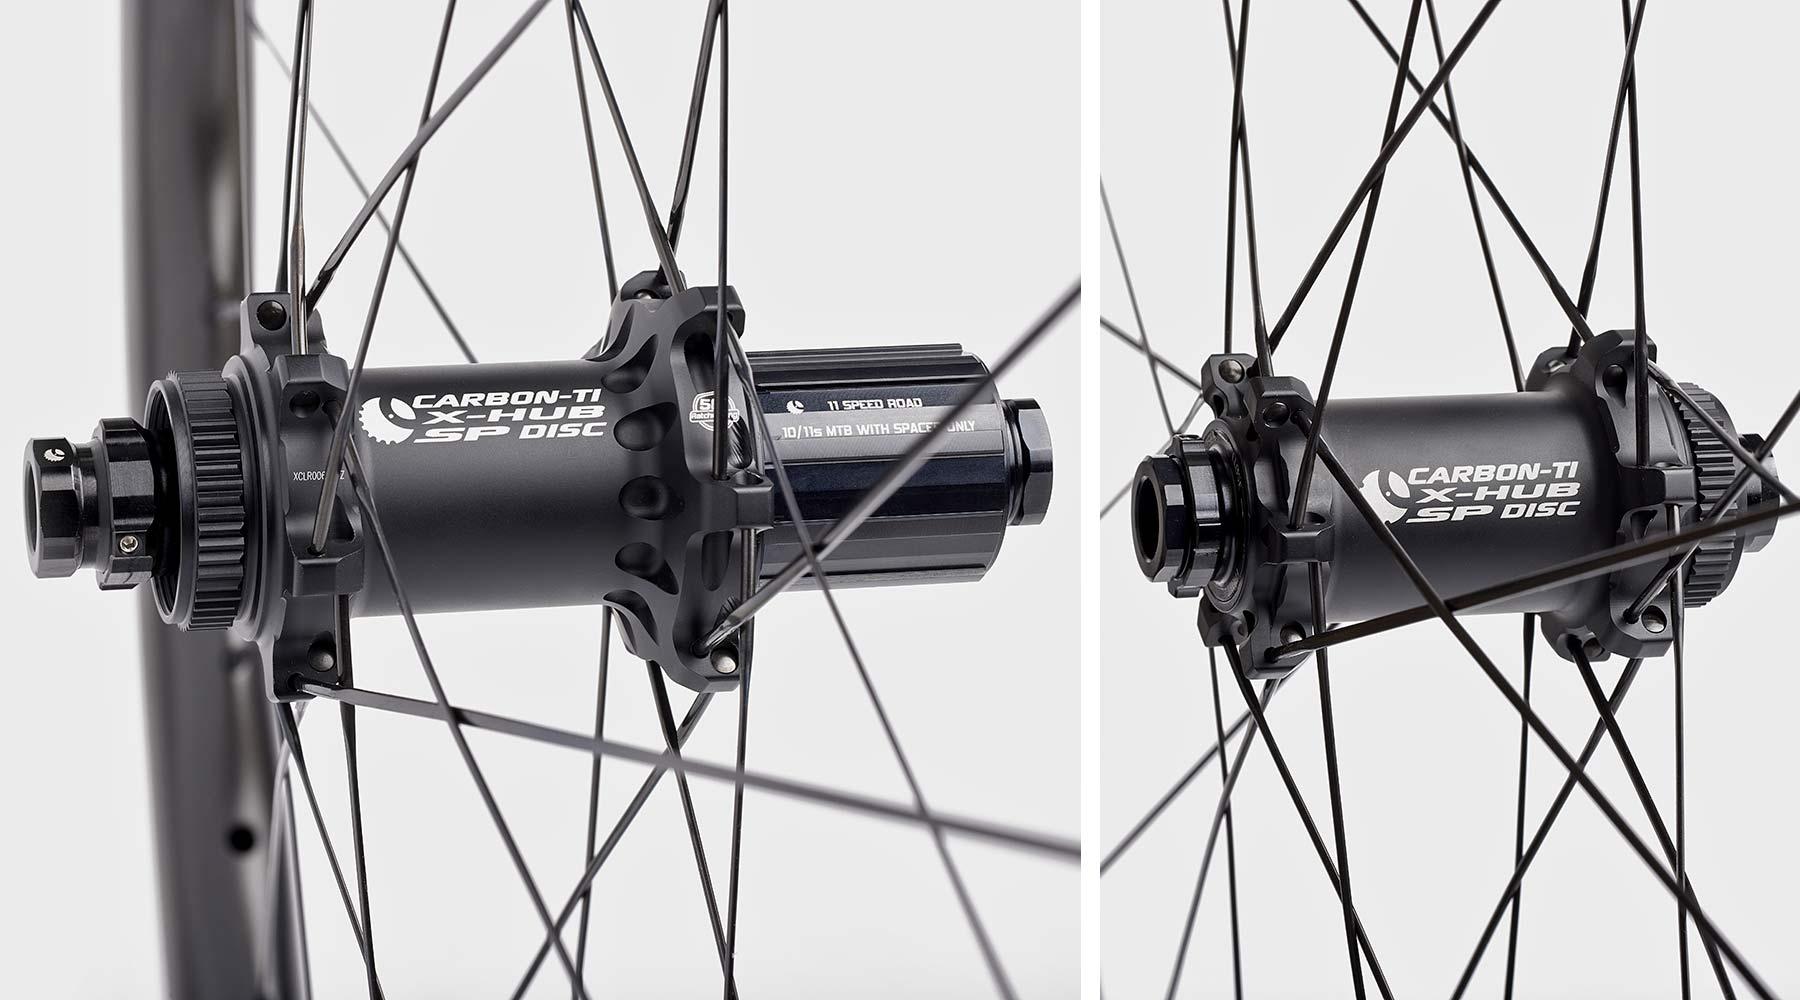 Princeton CarbonWorks Peak 4550 Launch Edition lightweight carbon aero road wheels,Carbon-Ti hubs